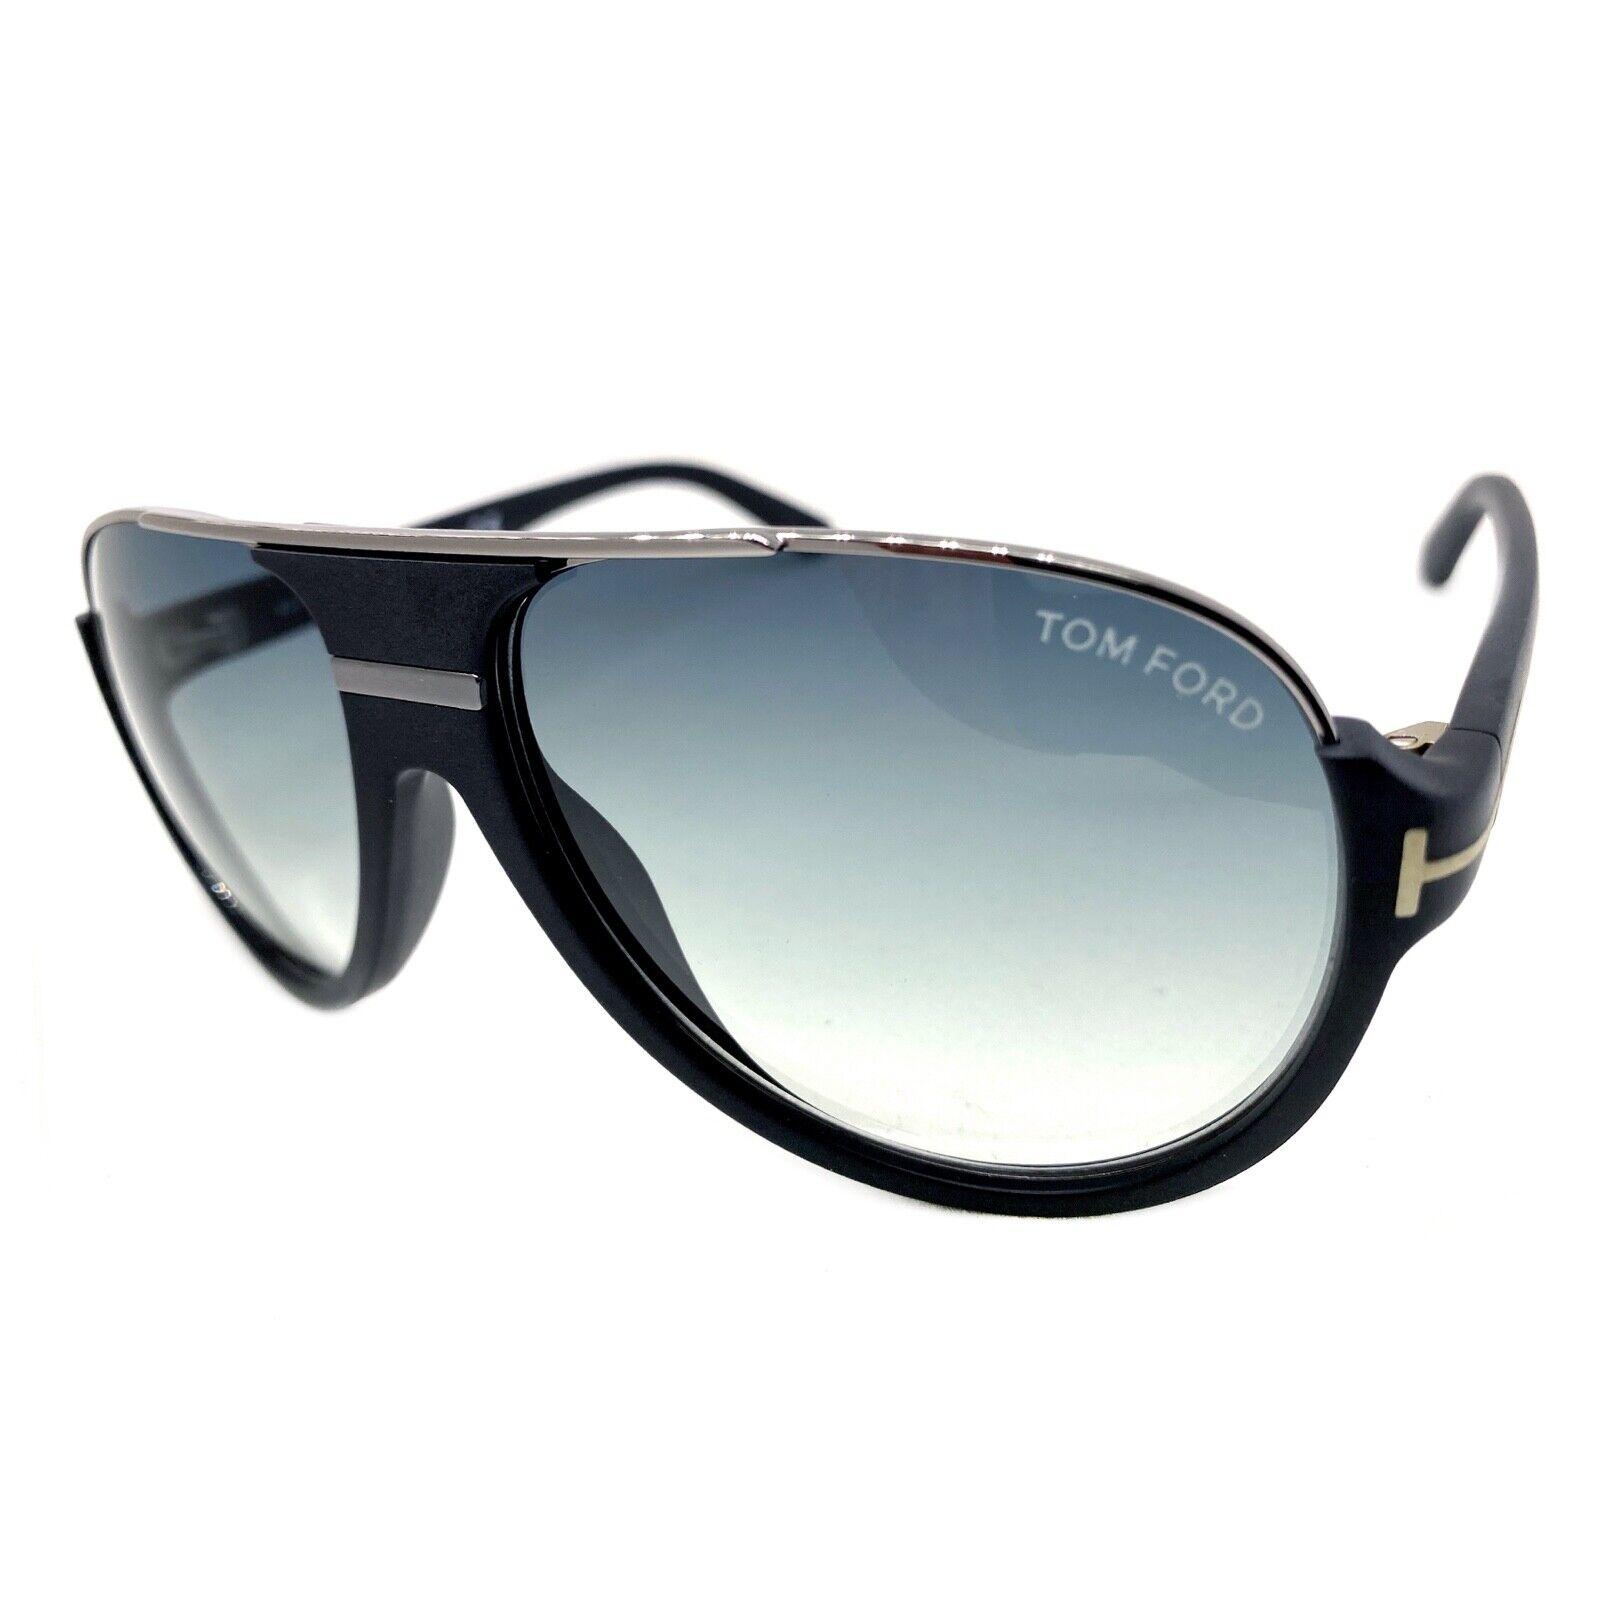 Tom Ford Sunglasses FT0334 DIMITRY 02W